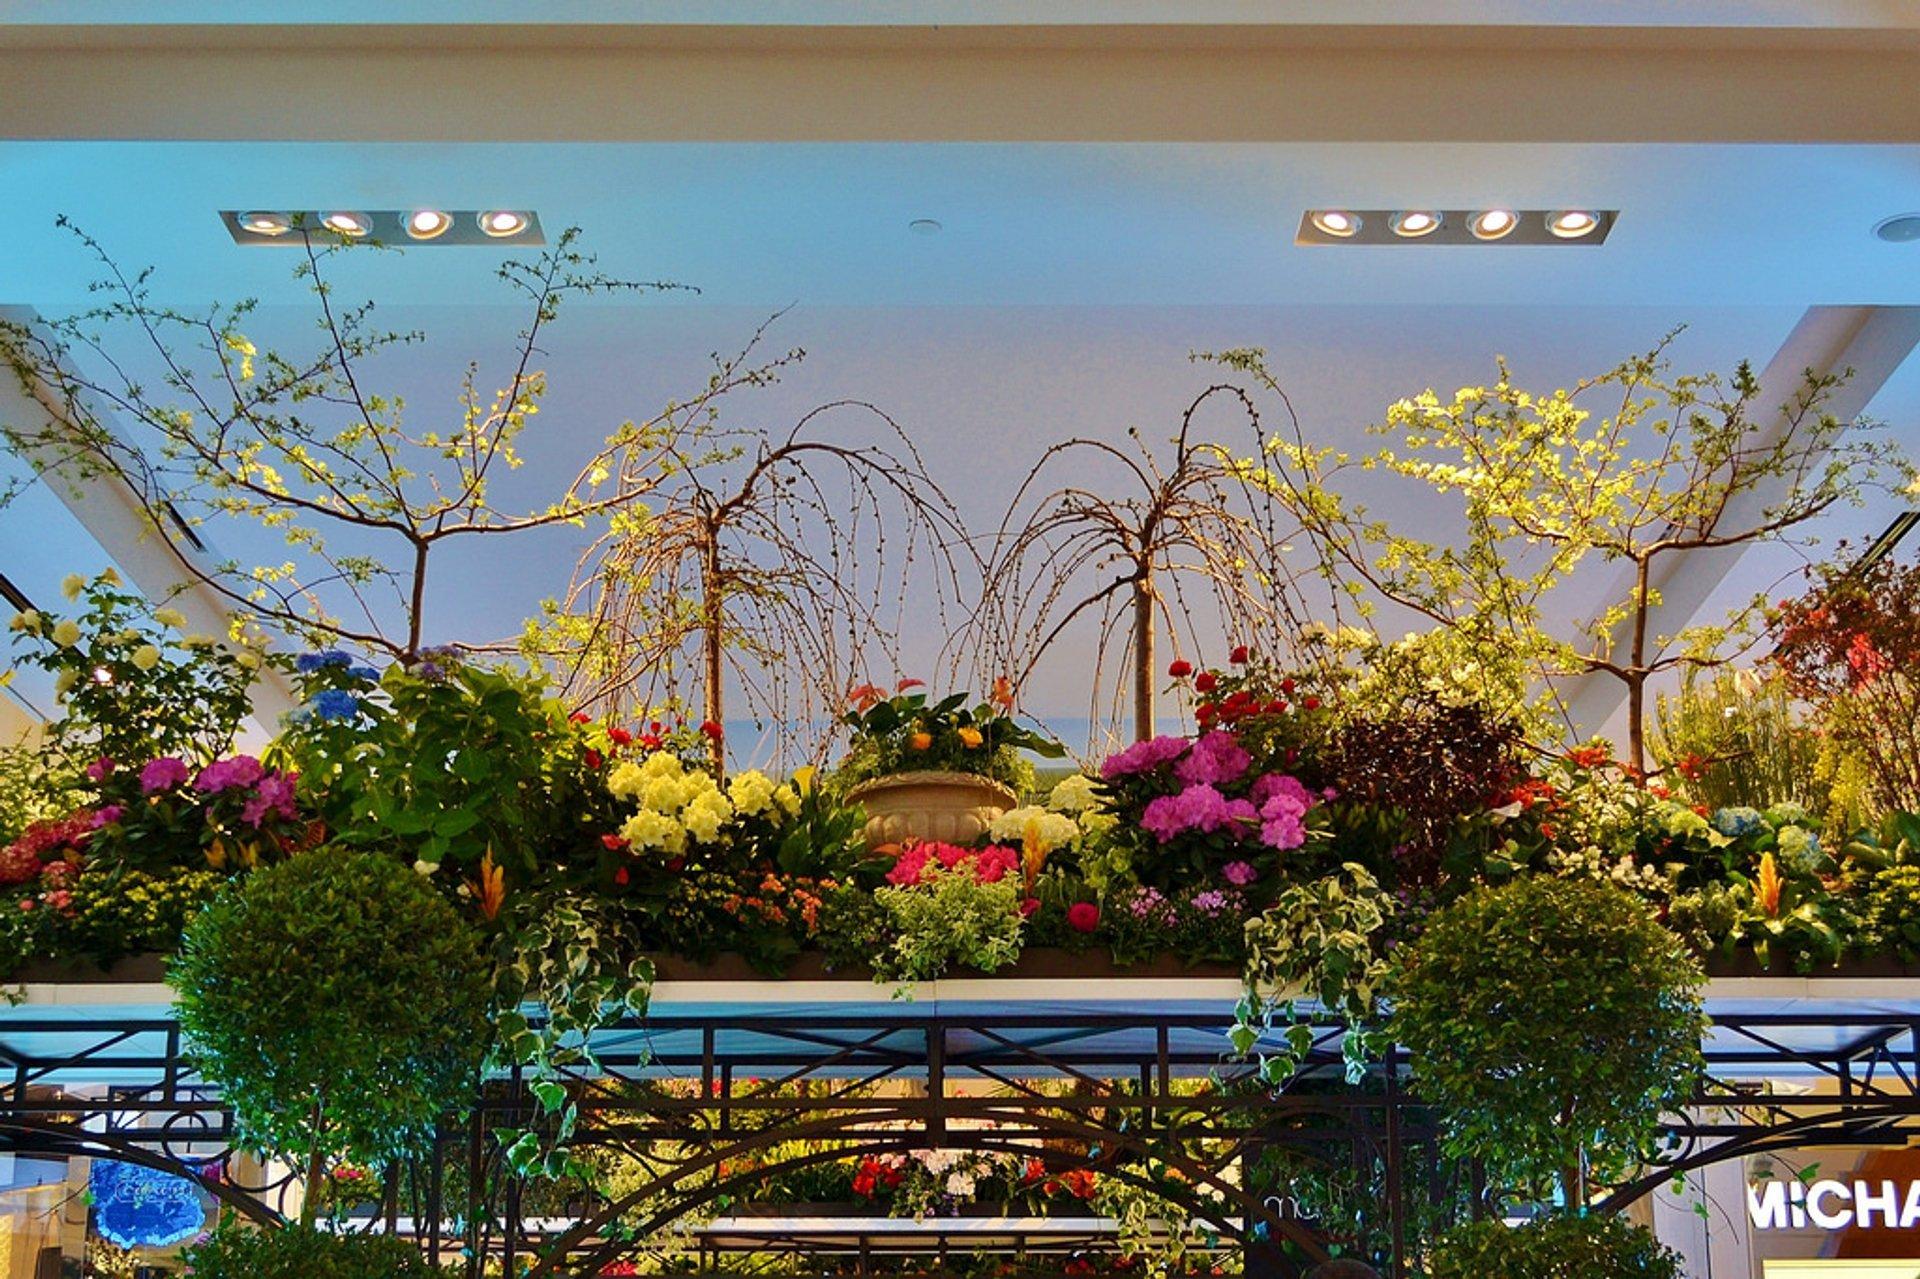 Macy's Flower Show in New York - Best Season 2020